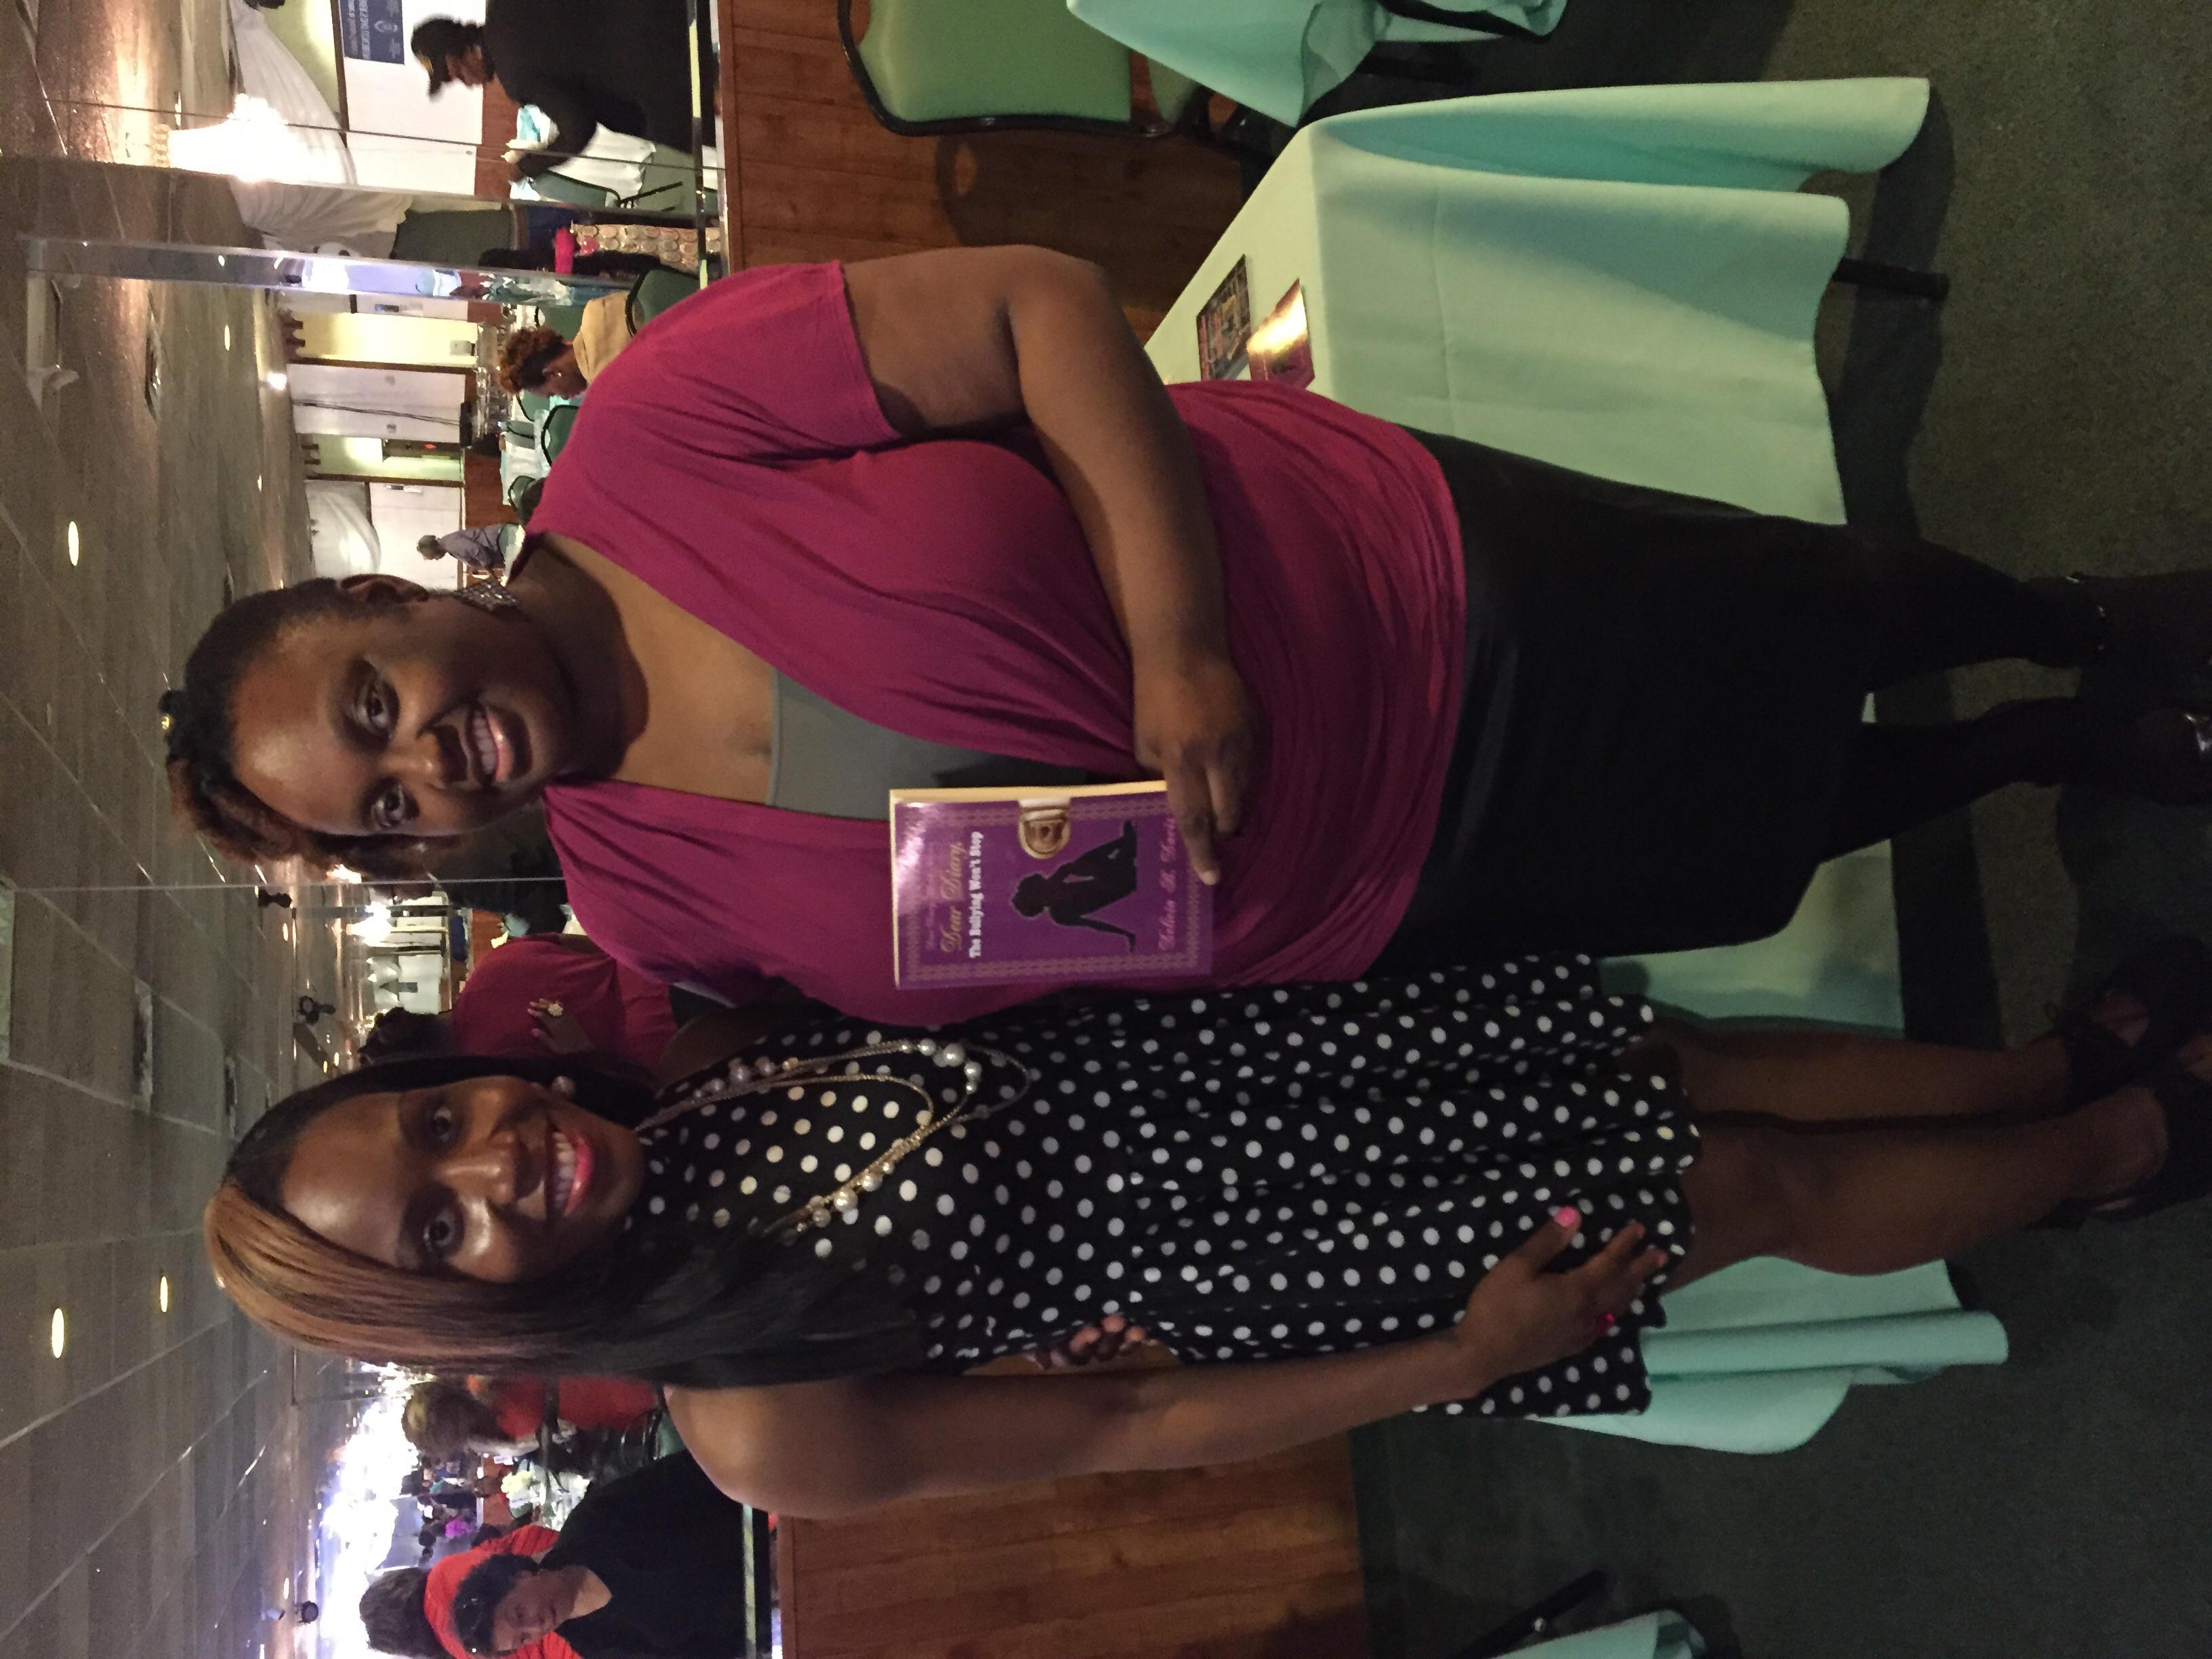 Author, Delicia B. Davis and me, Crystal Haynes of CrystalSays.com